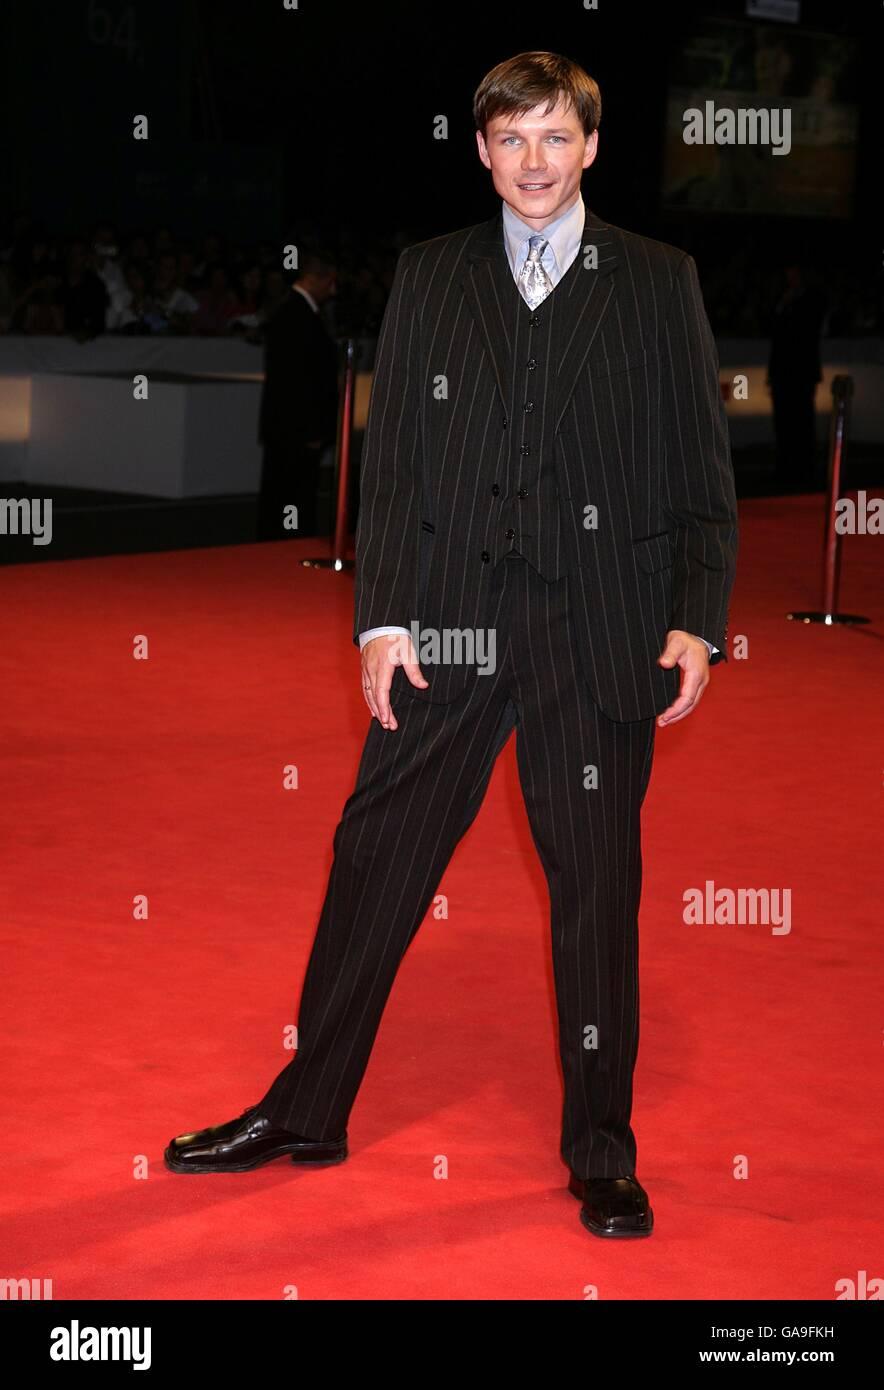 Venice Film Festival - Blade Runner: The Final Cut Premiere - Stock Image